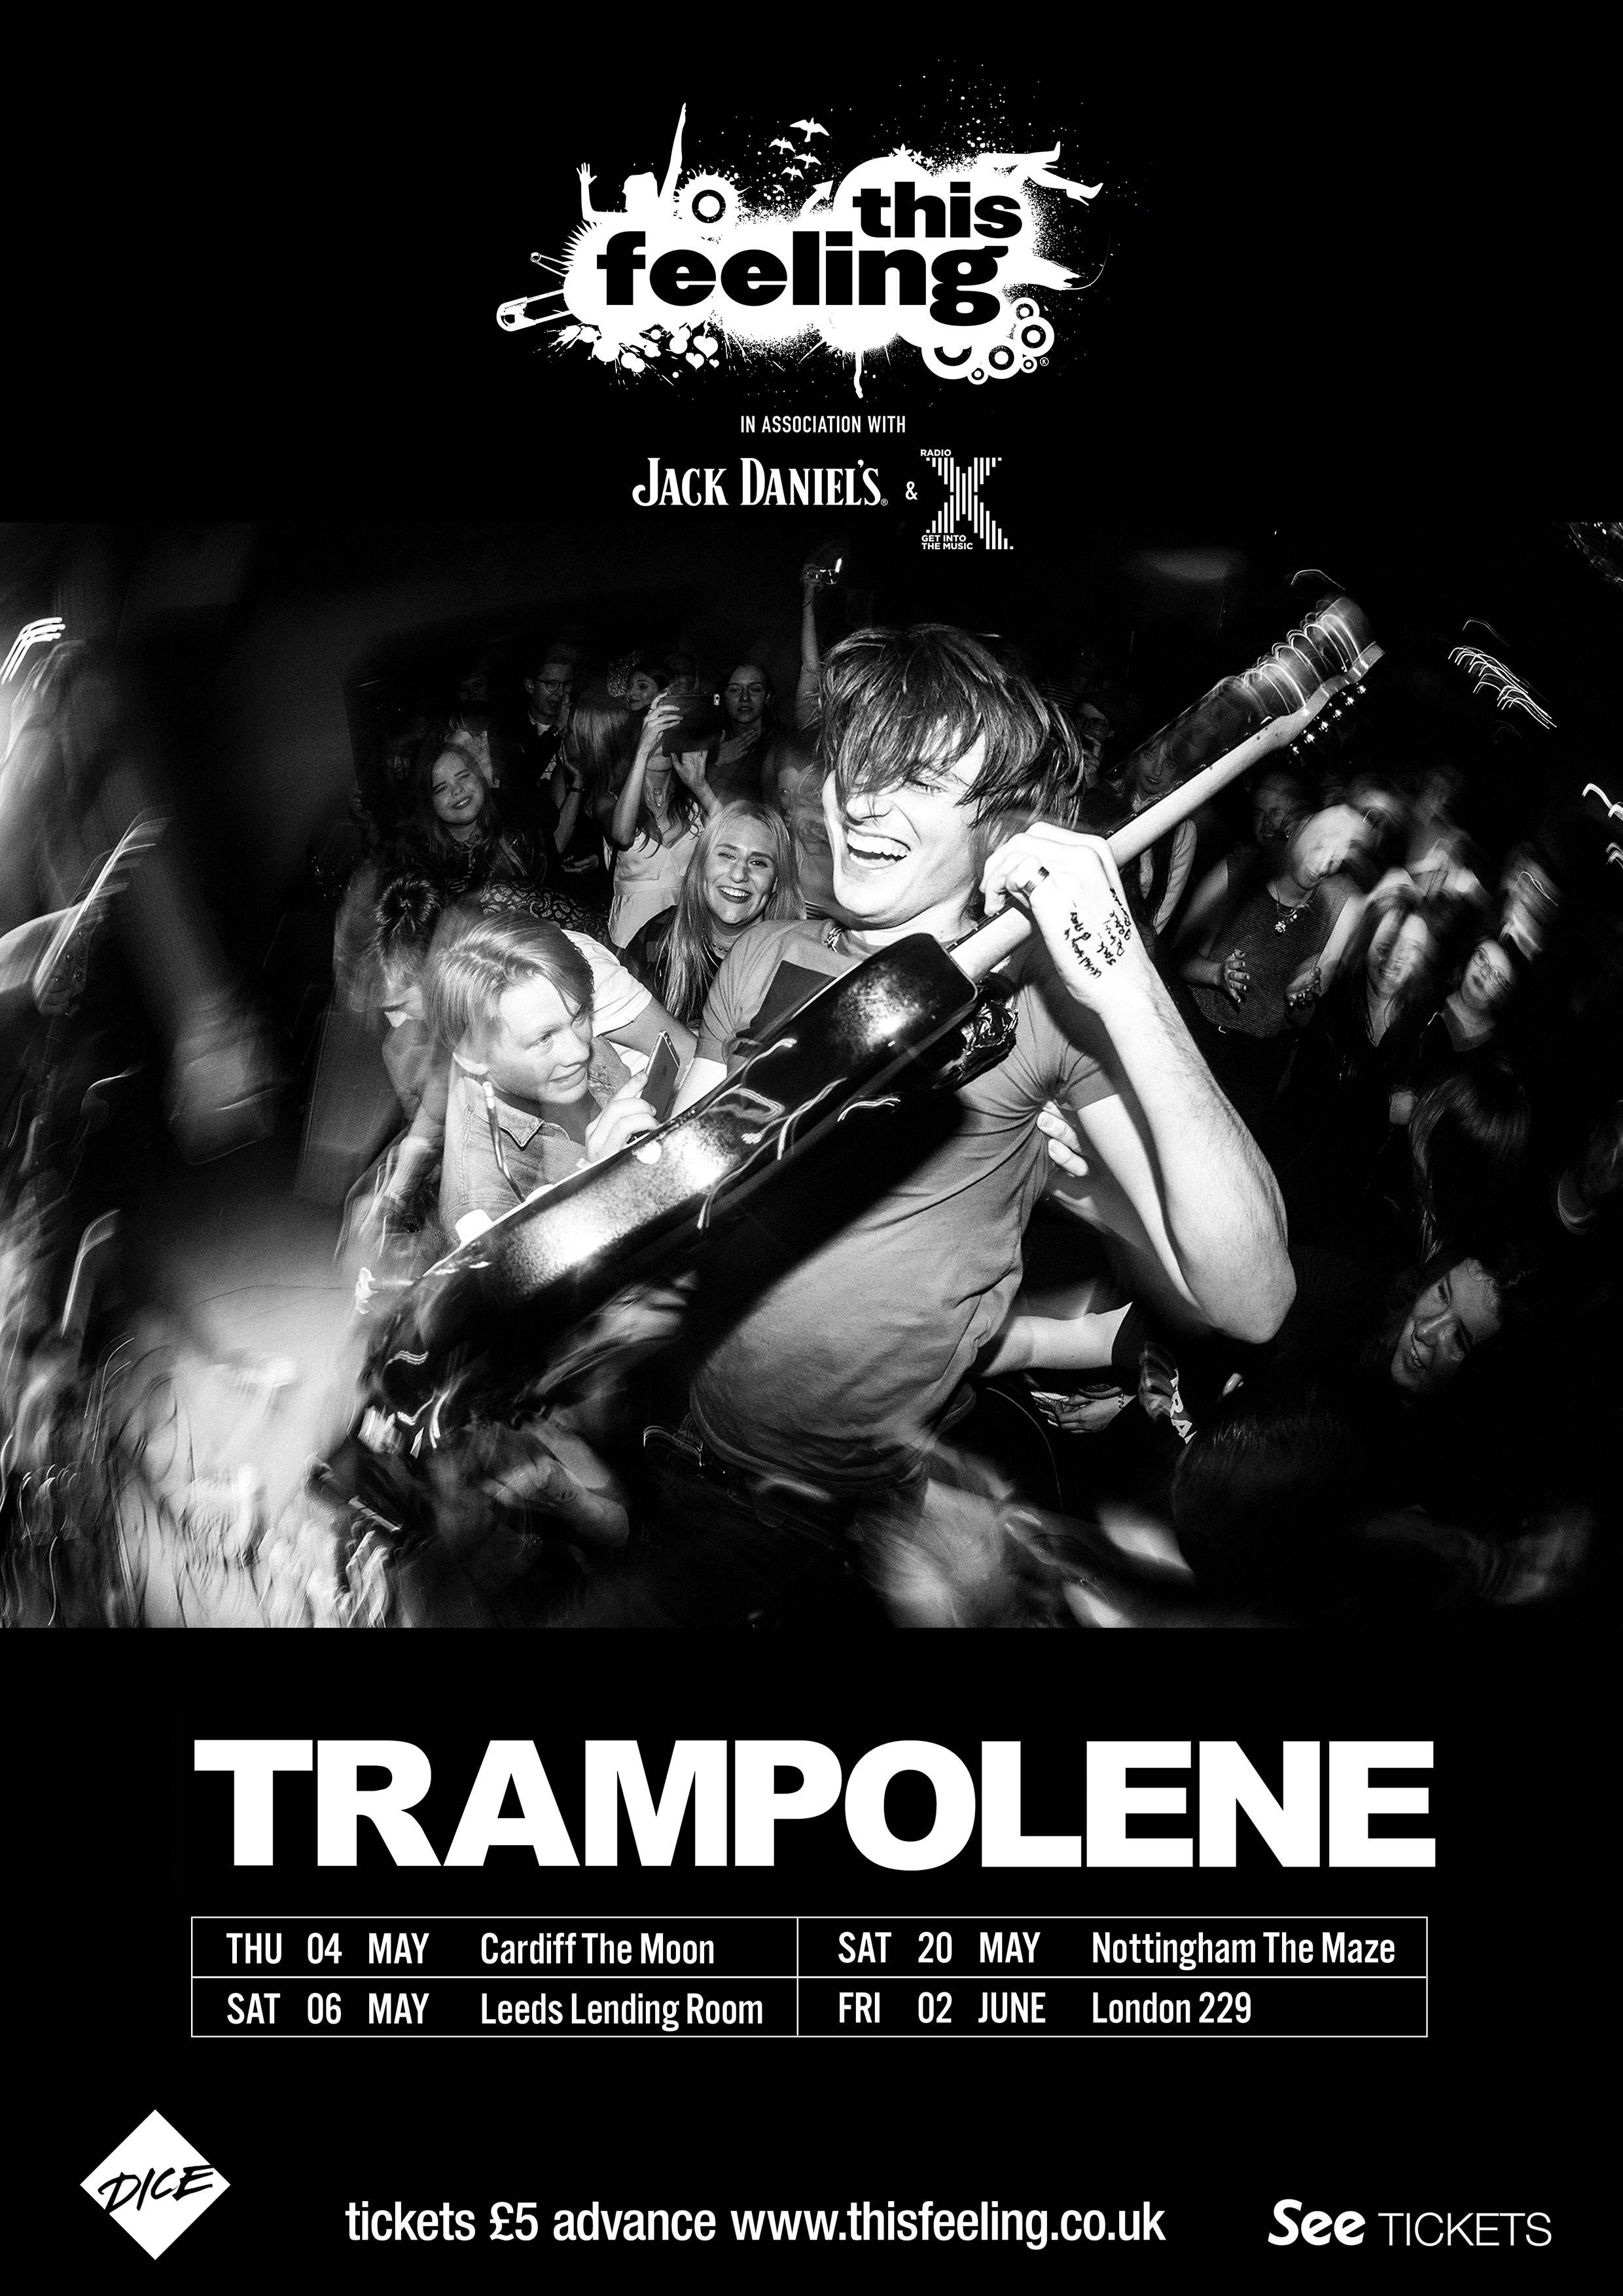 Trampolene (This Feeling)